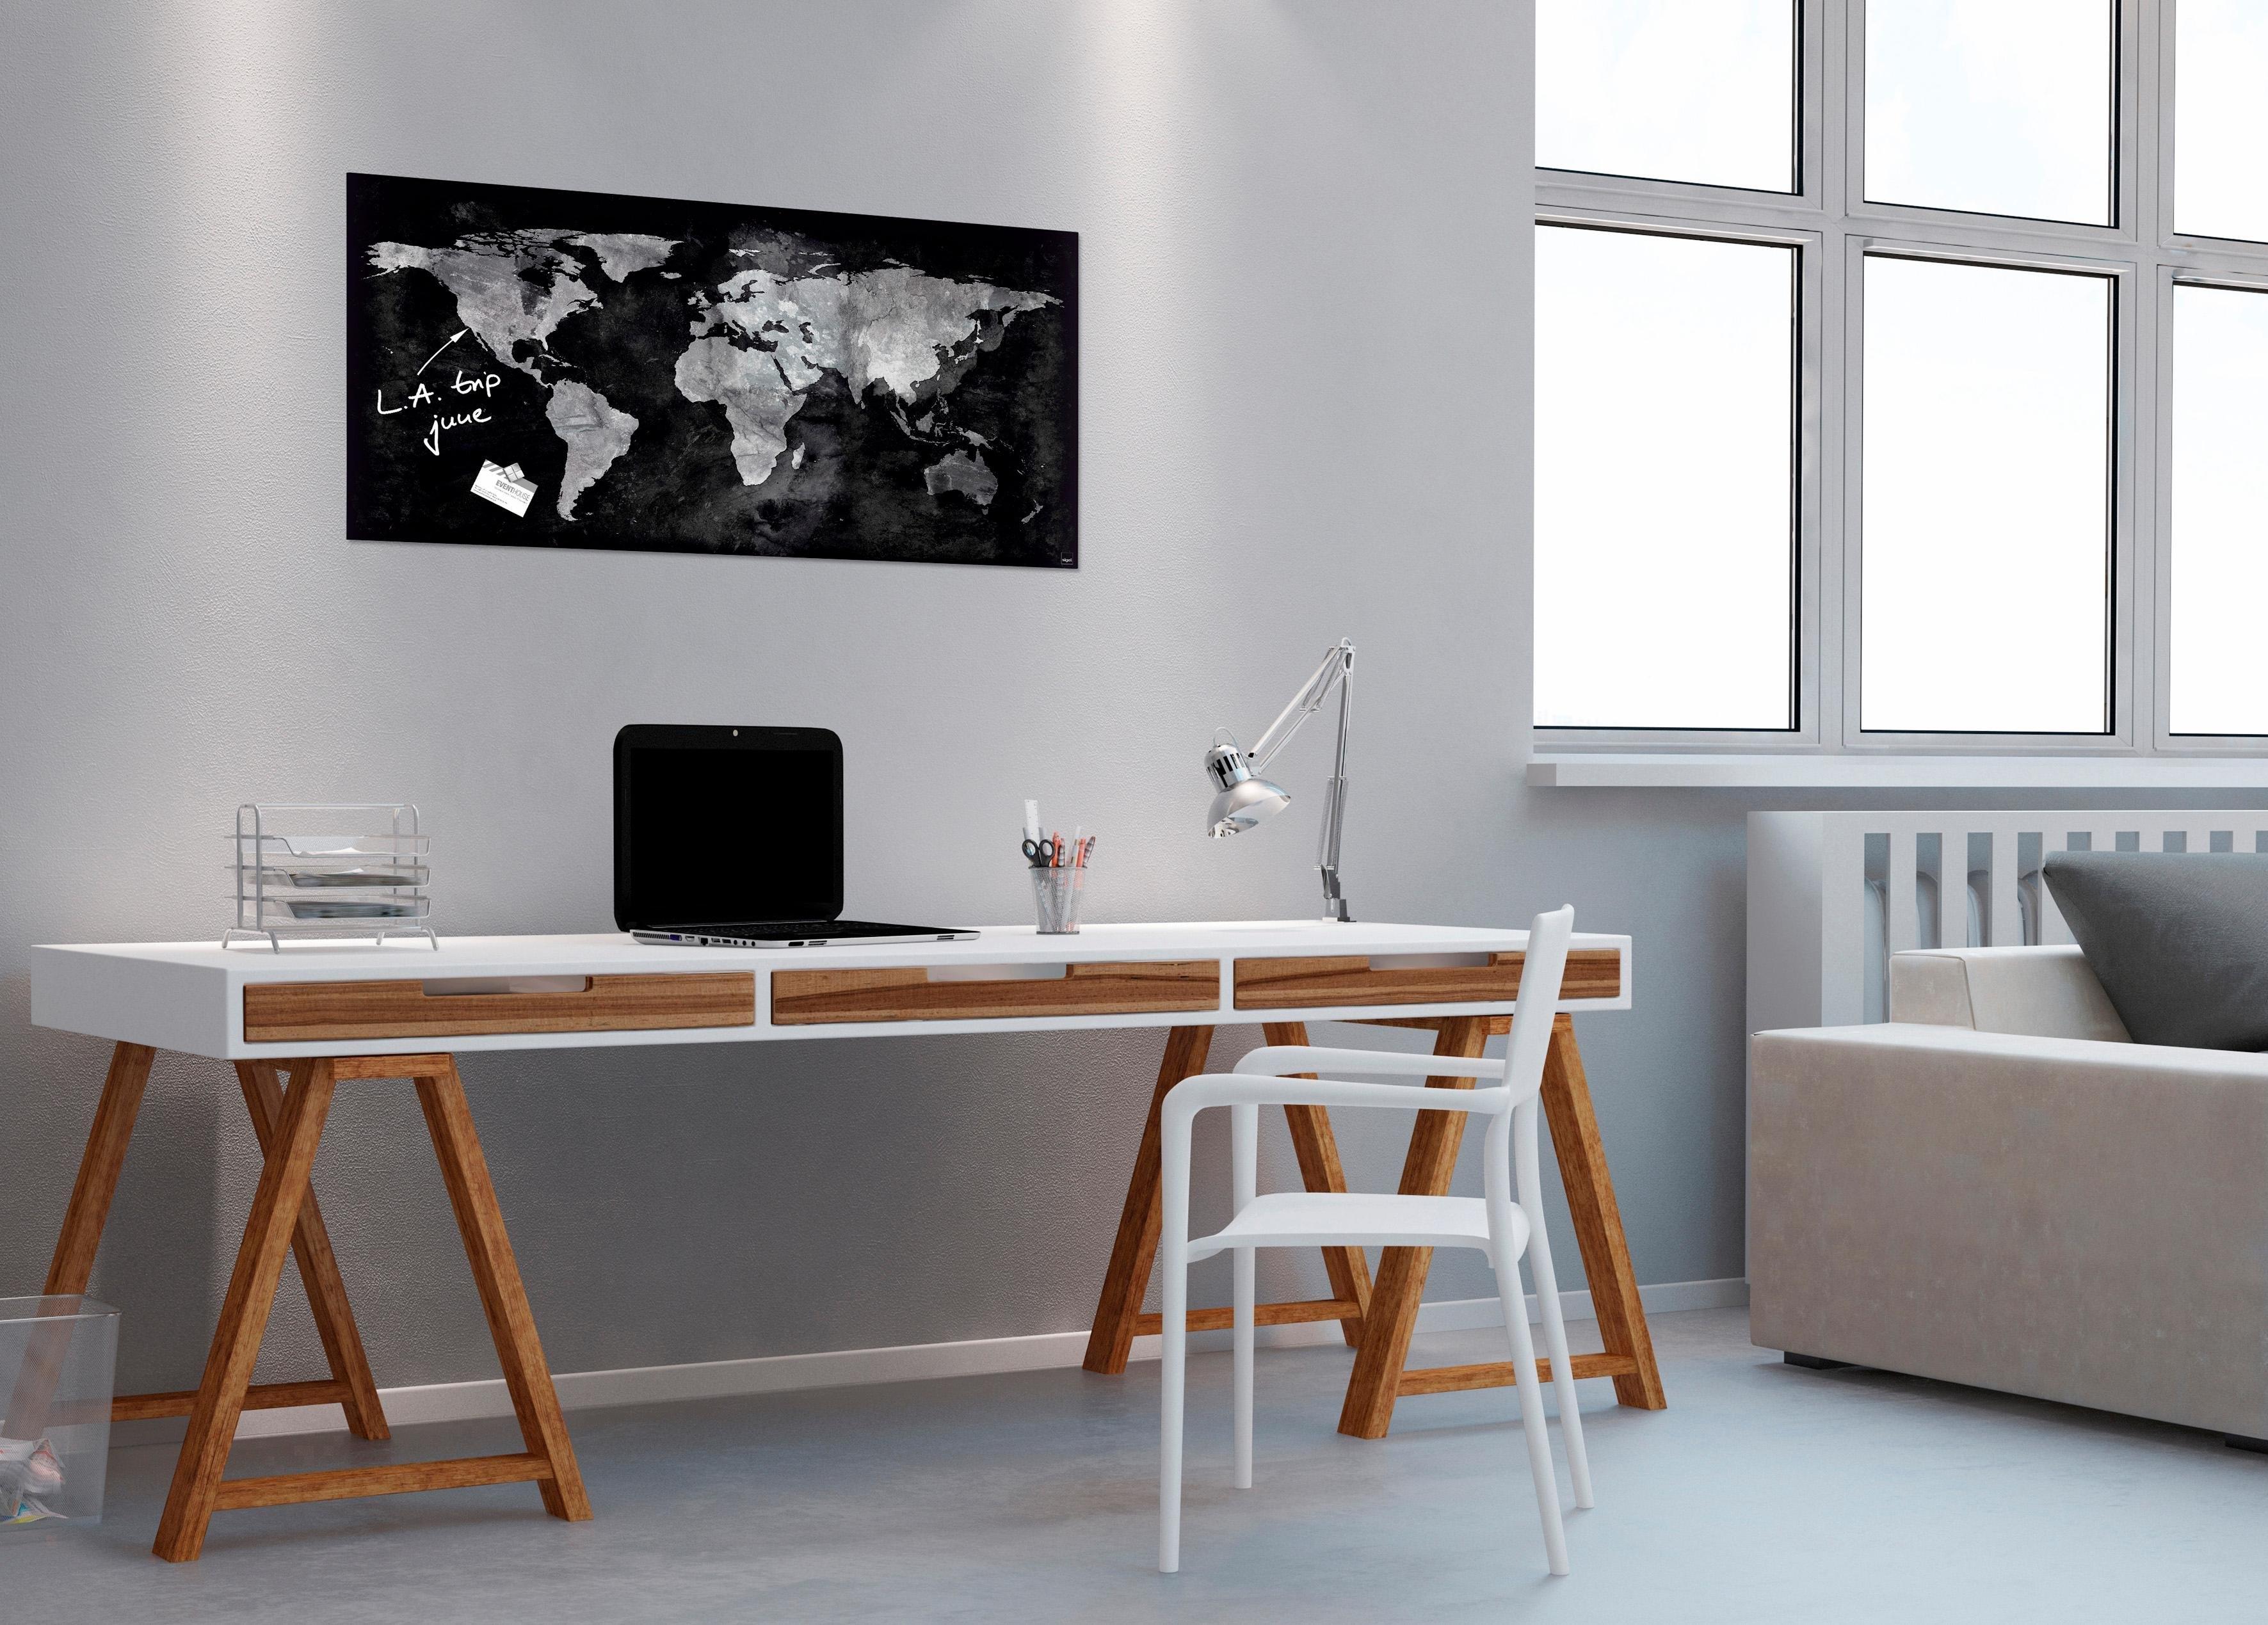 sigel magneetbord glas makkelijk gevonden otto. Black Bedroom Furniture Sets. Home Design Ideas